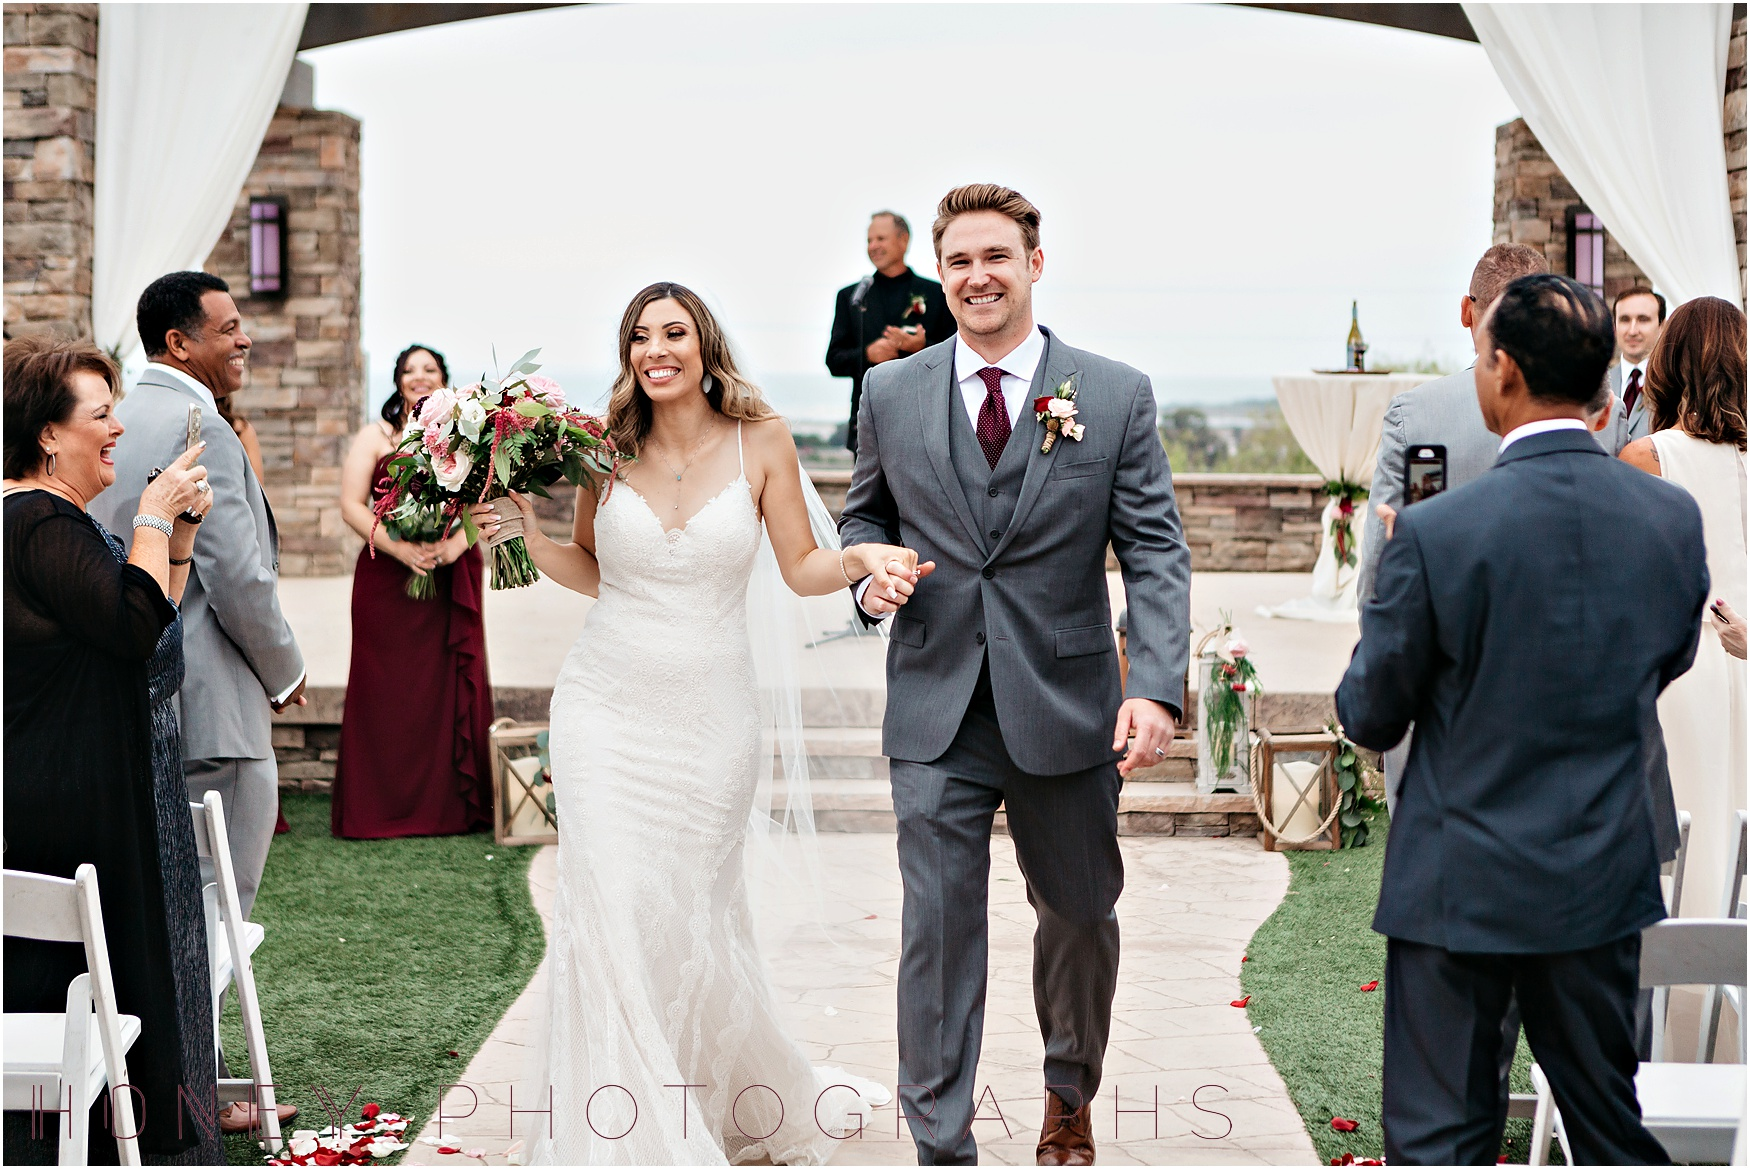 garden-classic-burgundy-jewel-tone-luxury-pacific-event-oceanside-wedding34.jpg